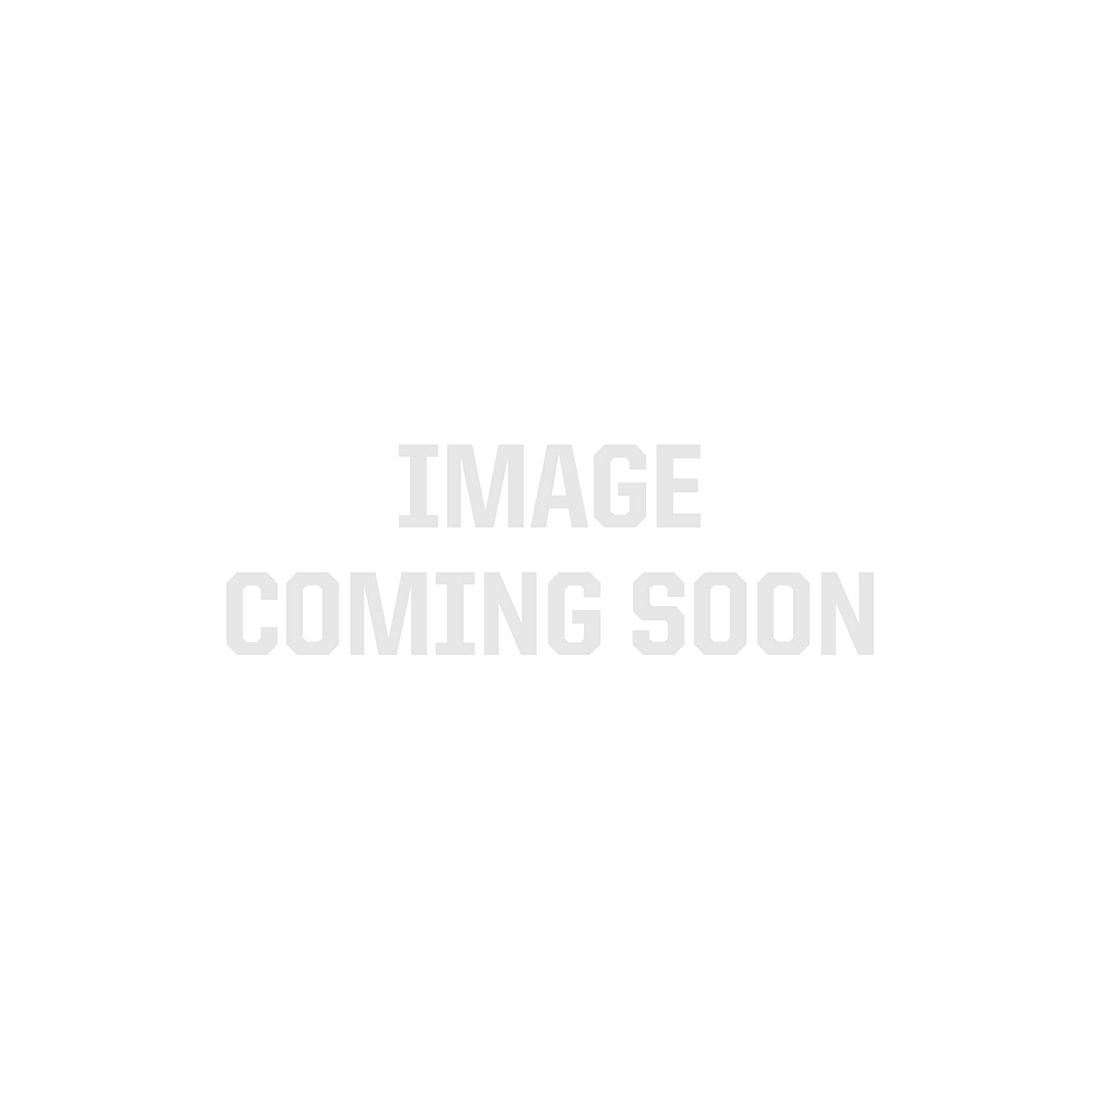 TruColor 2835 LED Strip Light - 6,500K - 160/m - CurrentControl - Sample Kit